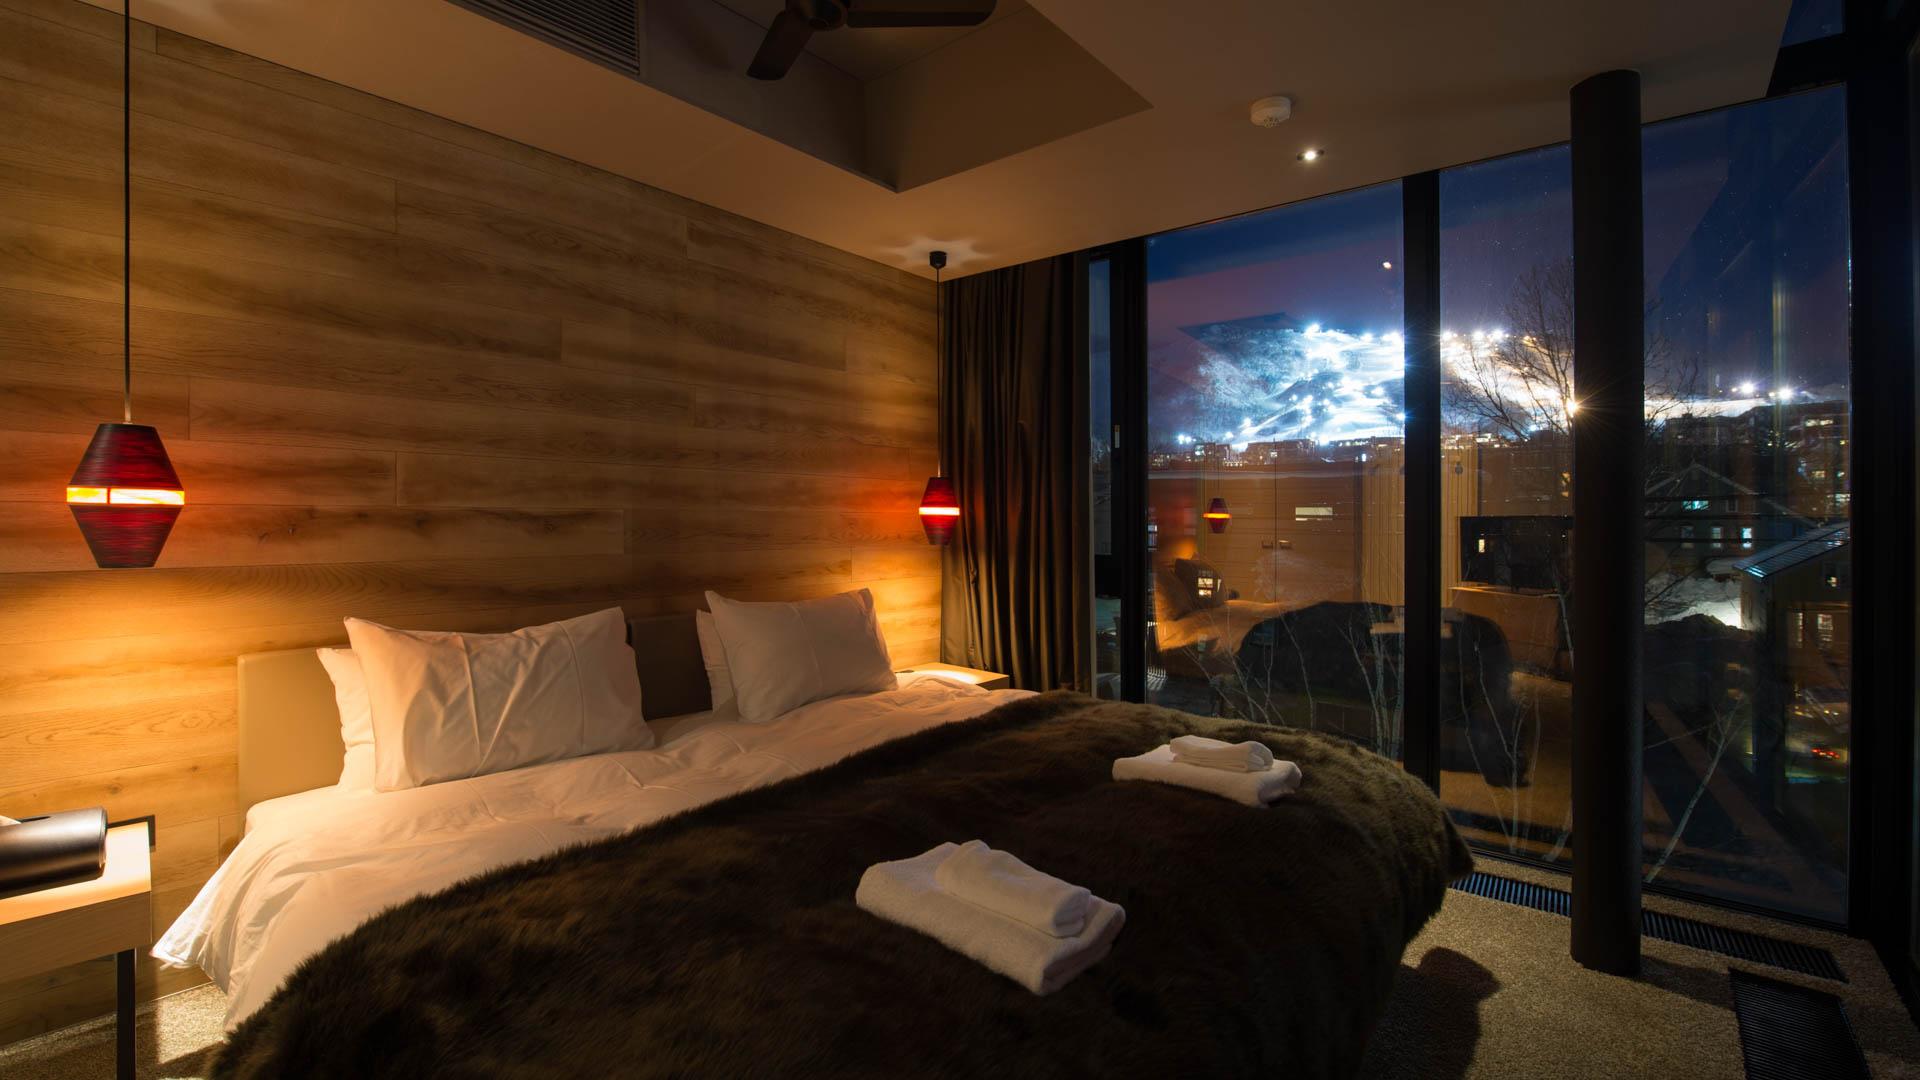 aspect-nupuri-bedroom_32316840160_o